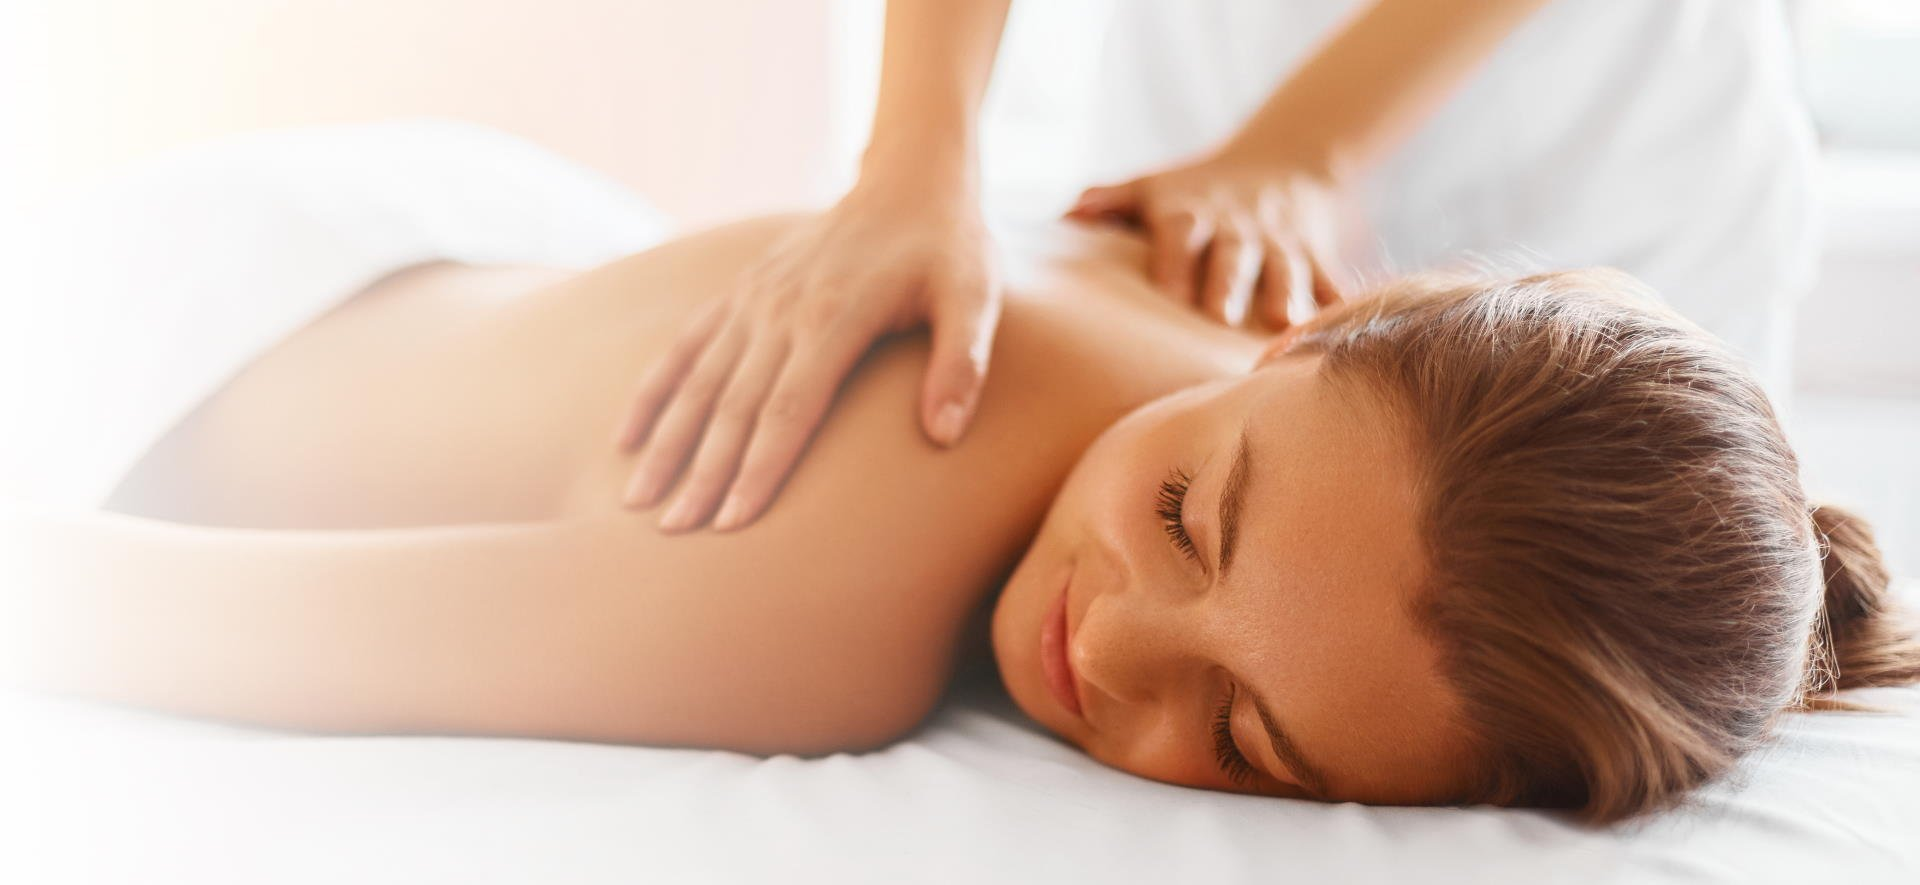 Professional Body Massage, Professional Body Massage, Full Body Massage Service